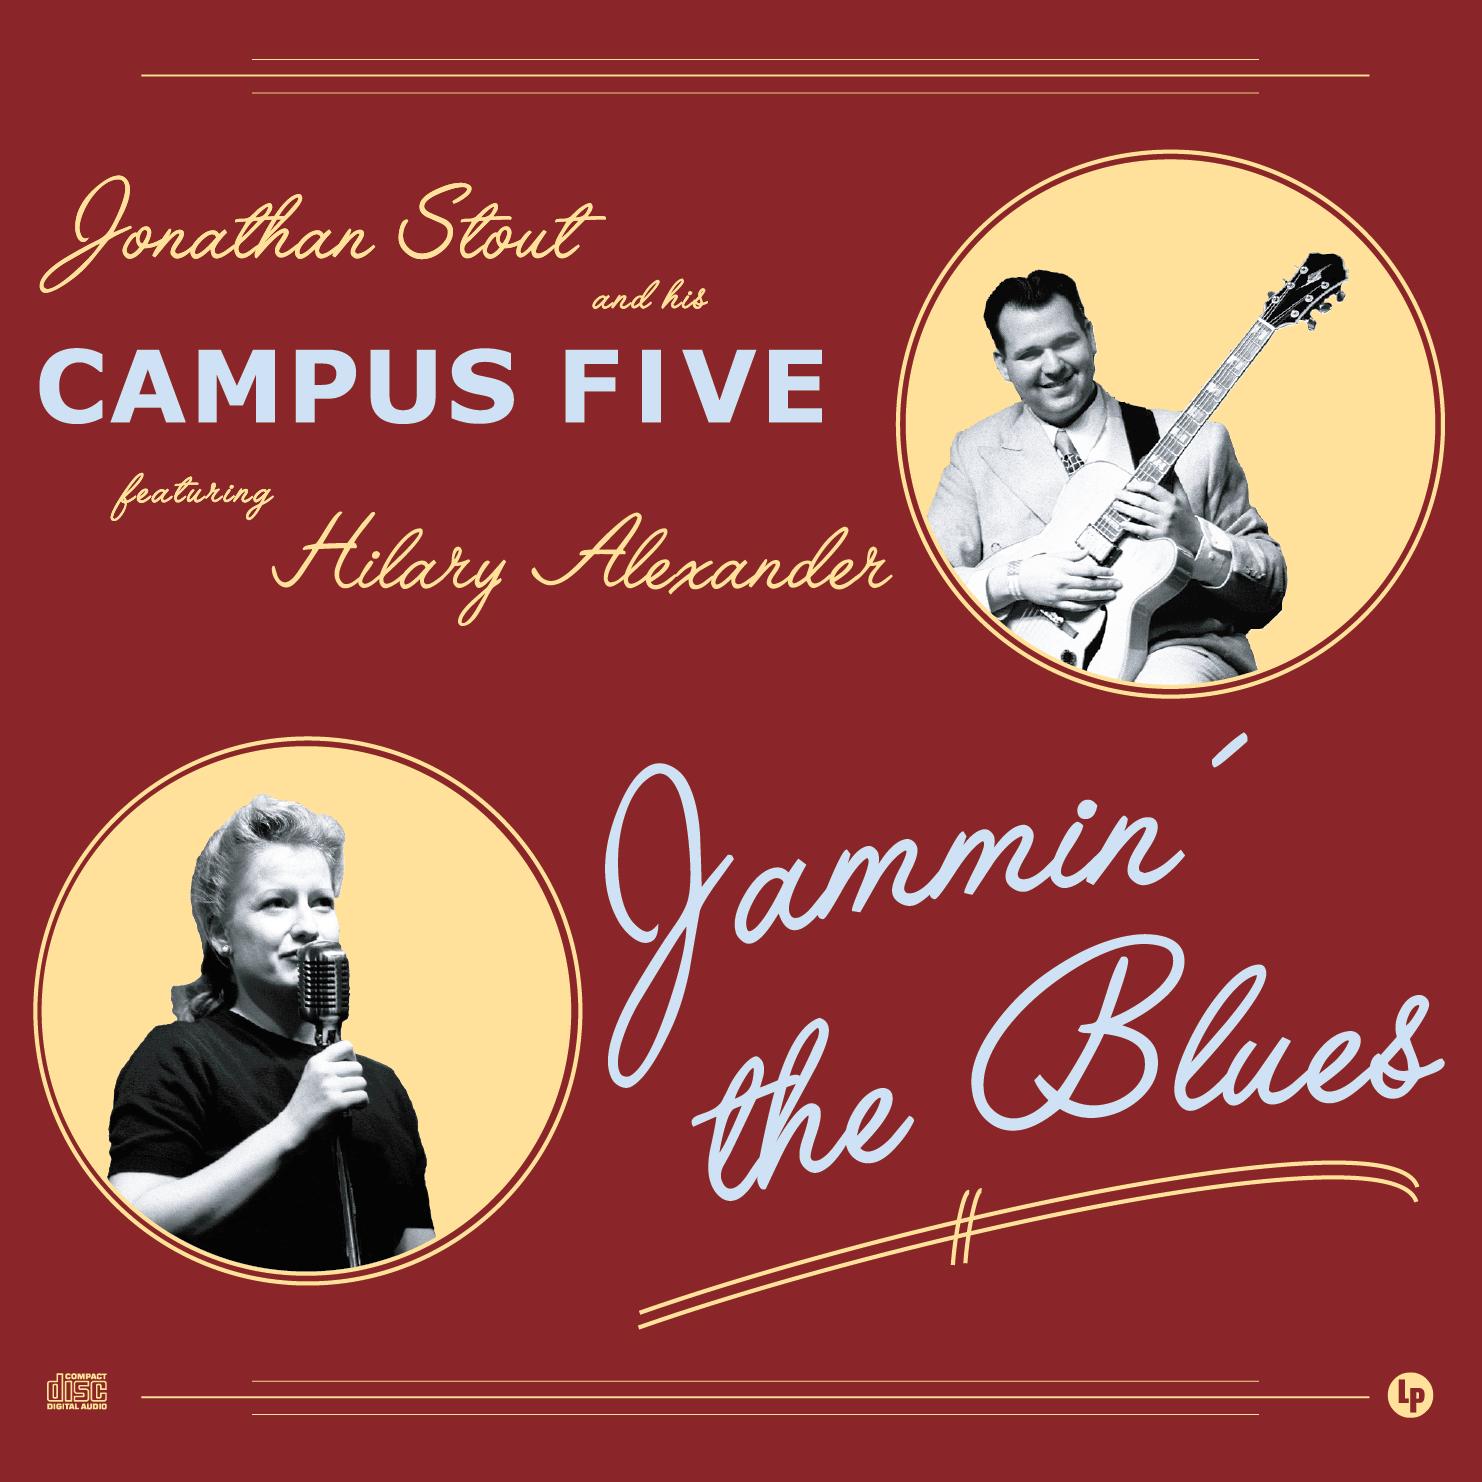 - Jammin' the Blues (2003)